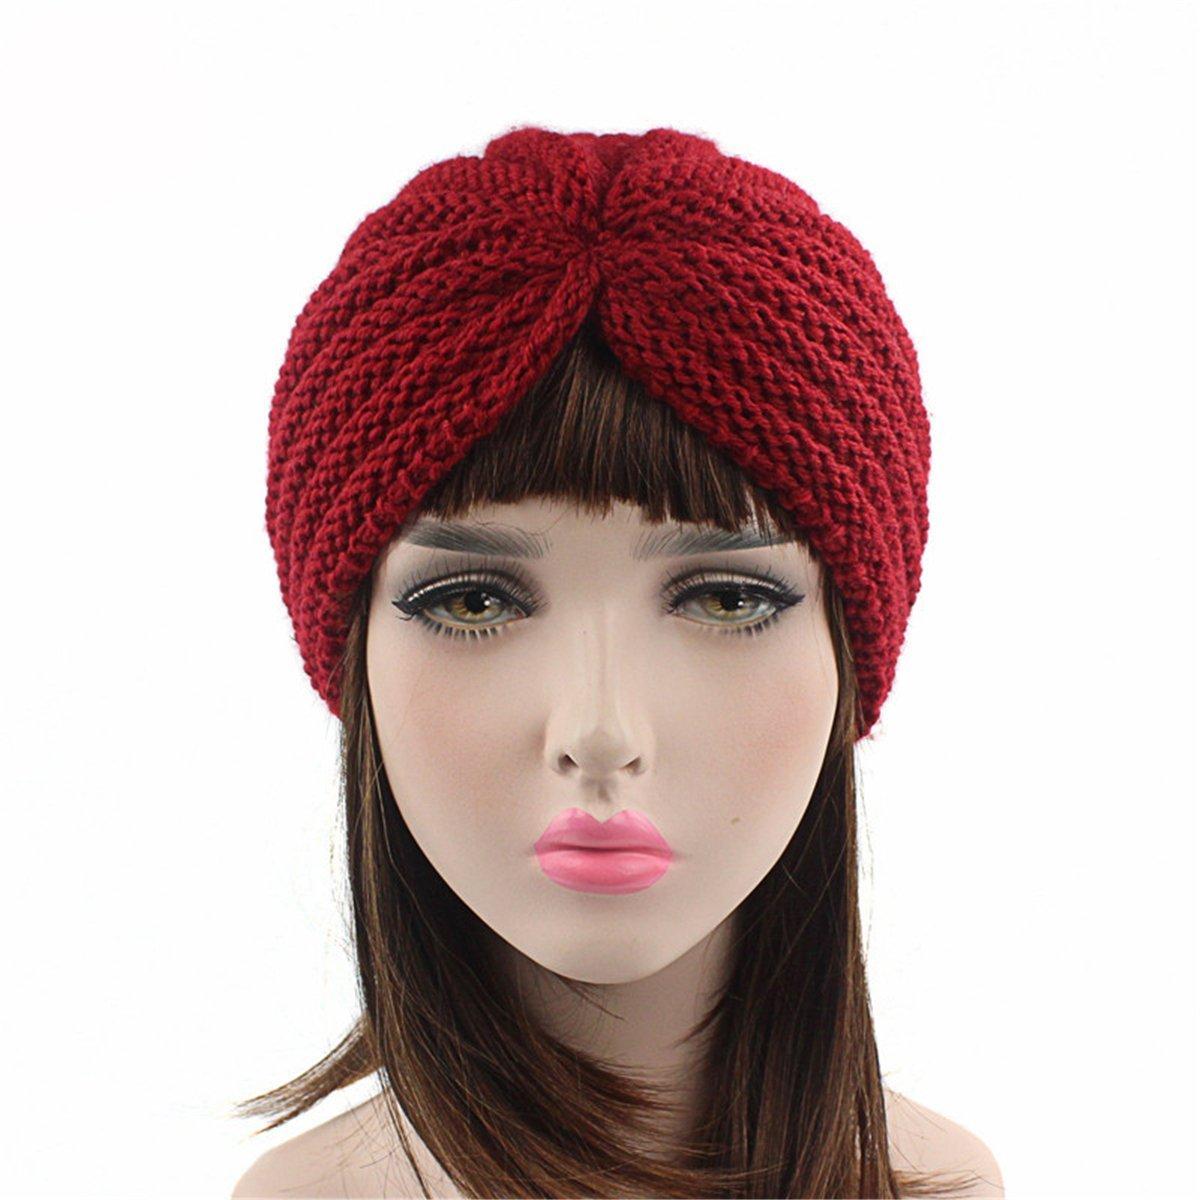 eb1b7b750fb Buy Turban Plus The Abbey Cap in Cotton Knit Chemo Caps Cancer Hats ...